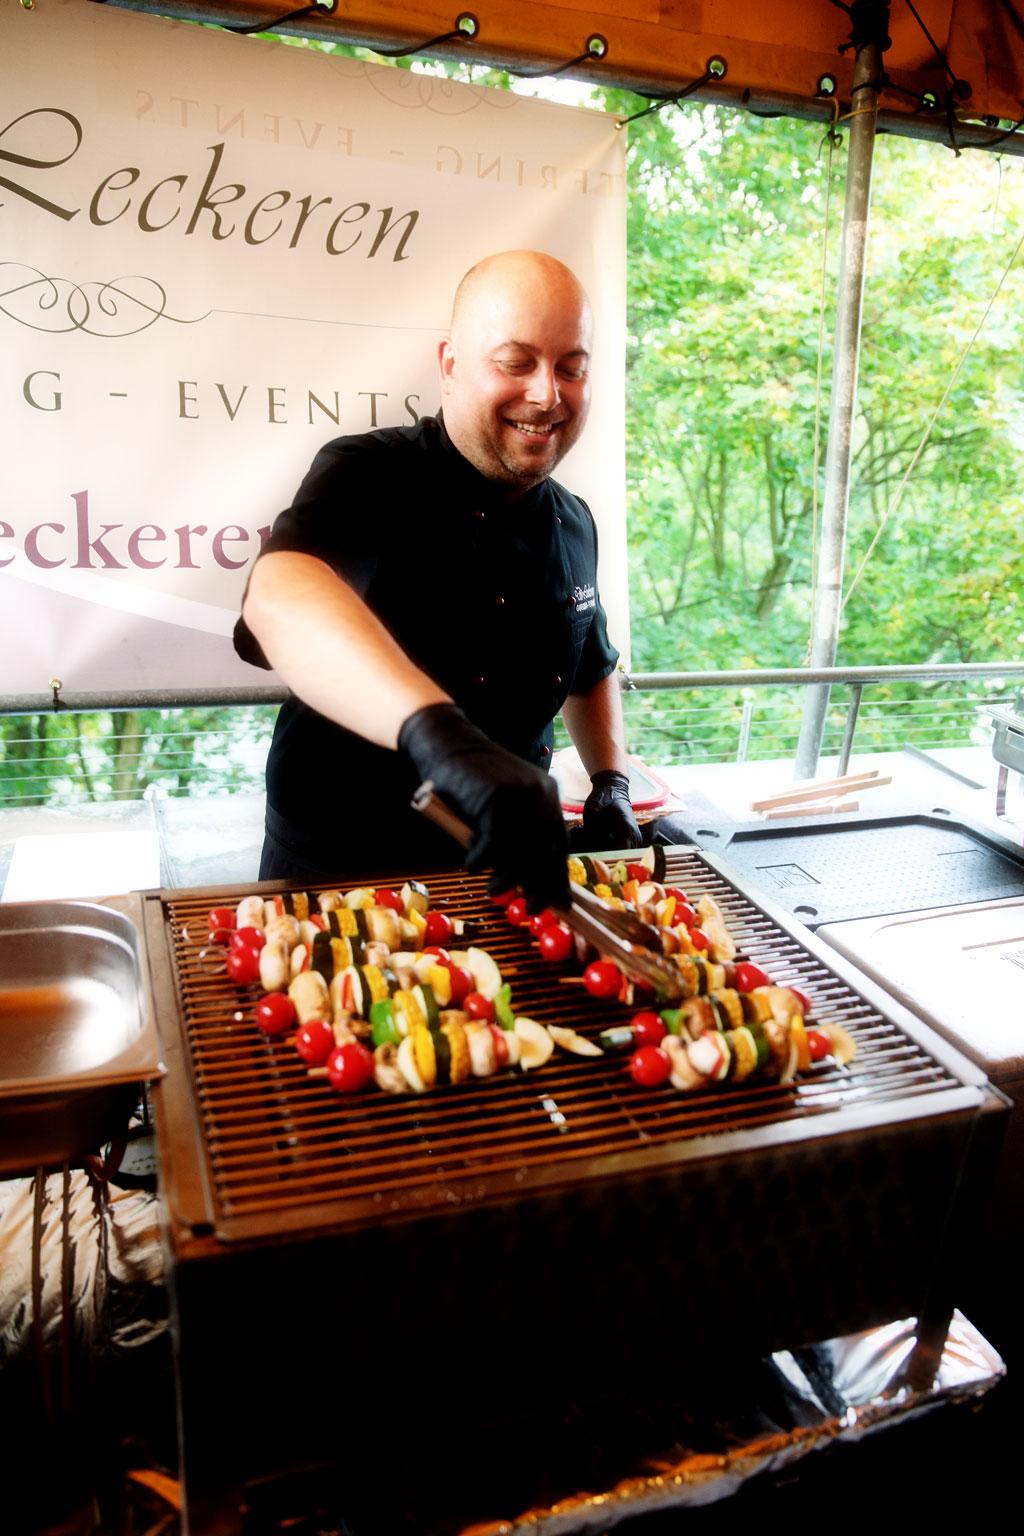 Die Leckeren - Grill Catering